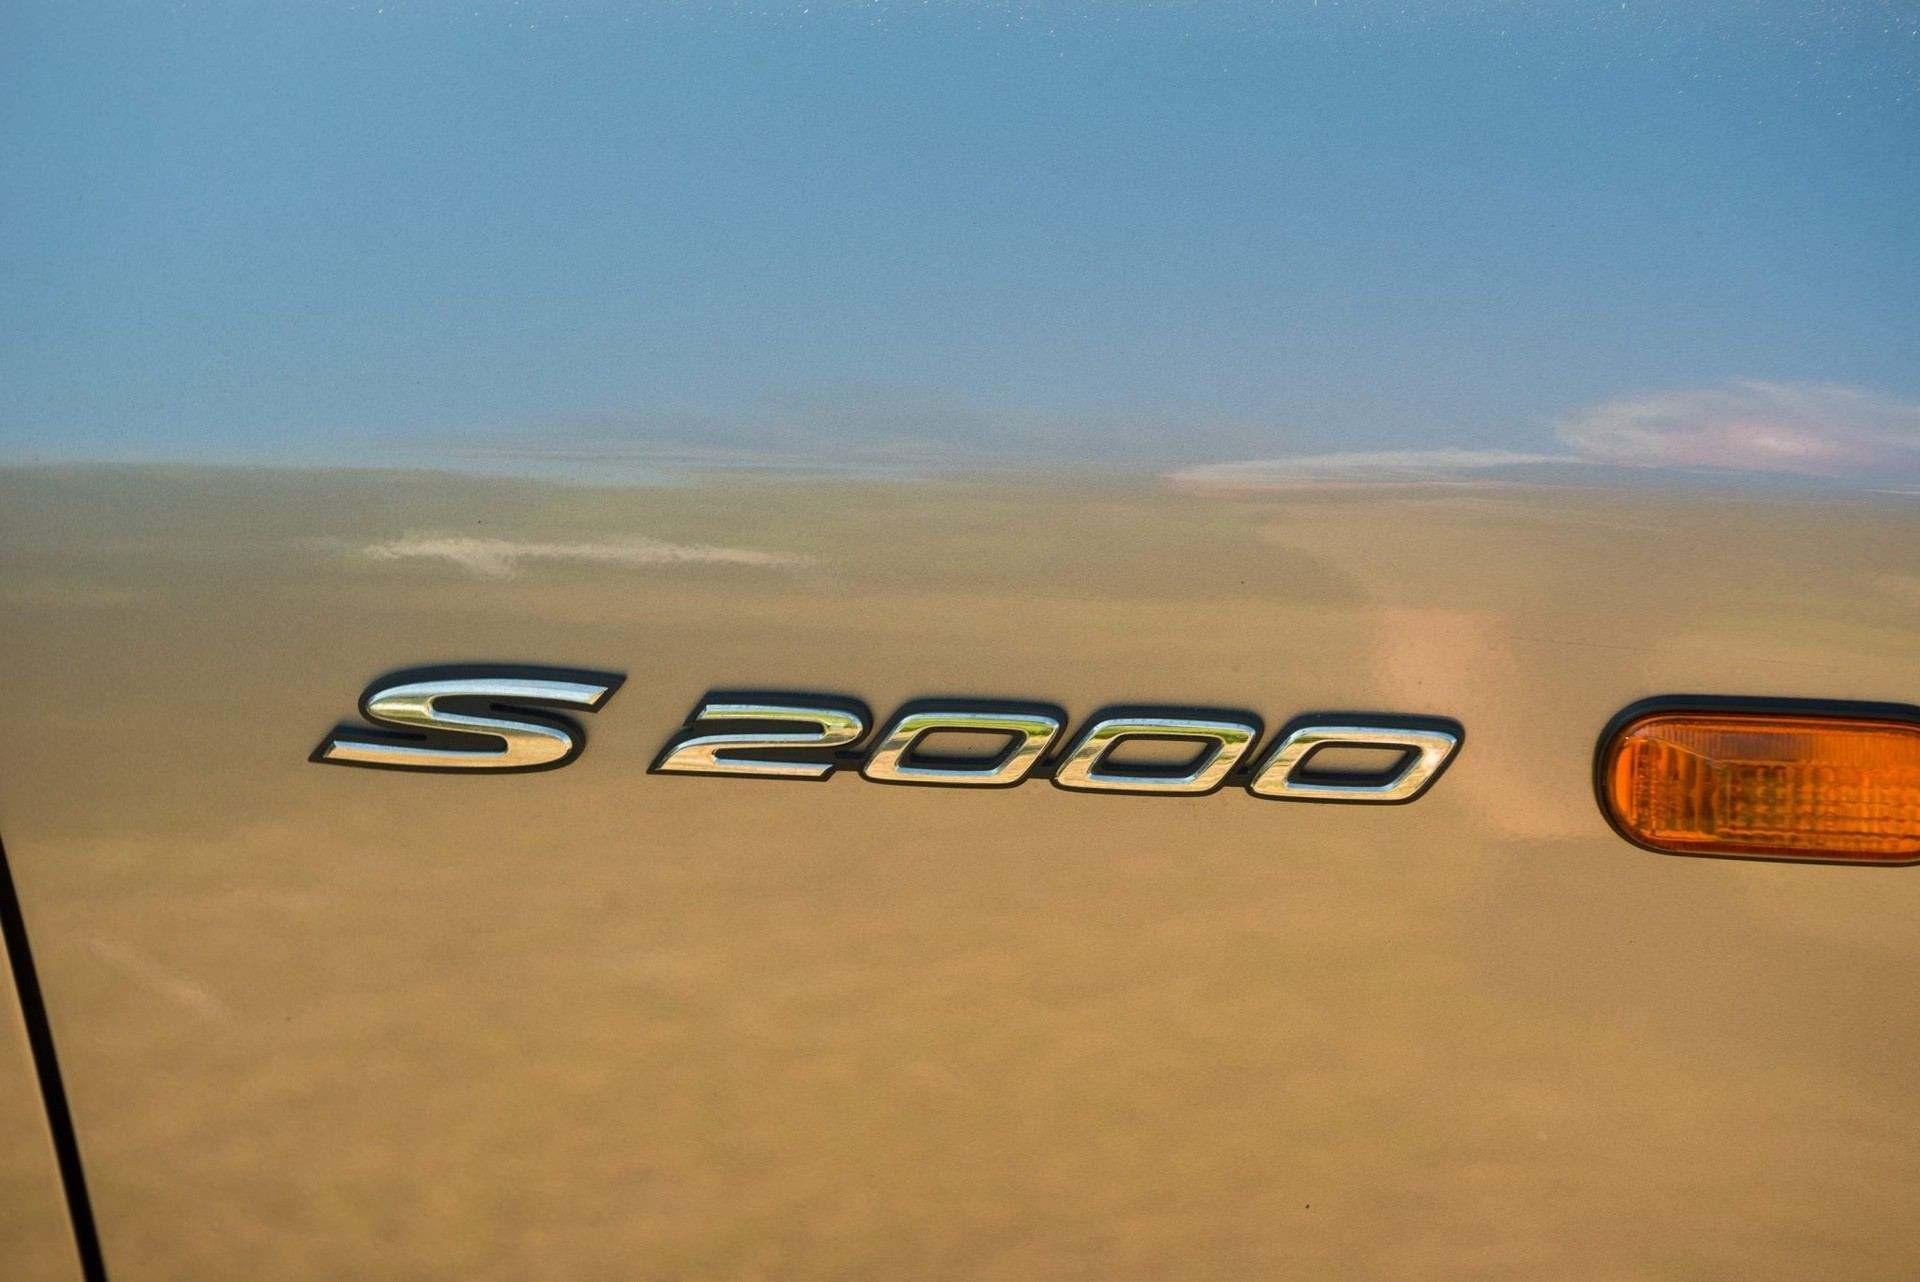 2000_Honda_S2000_auction-0033